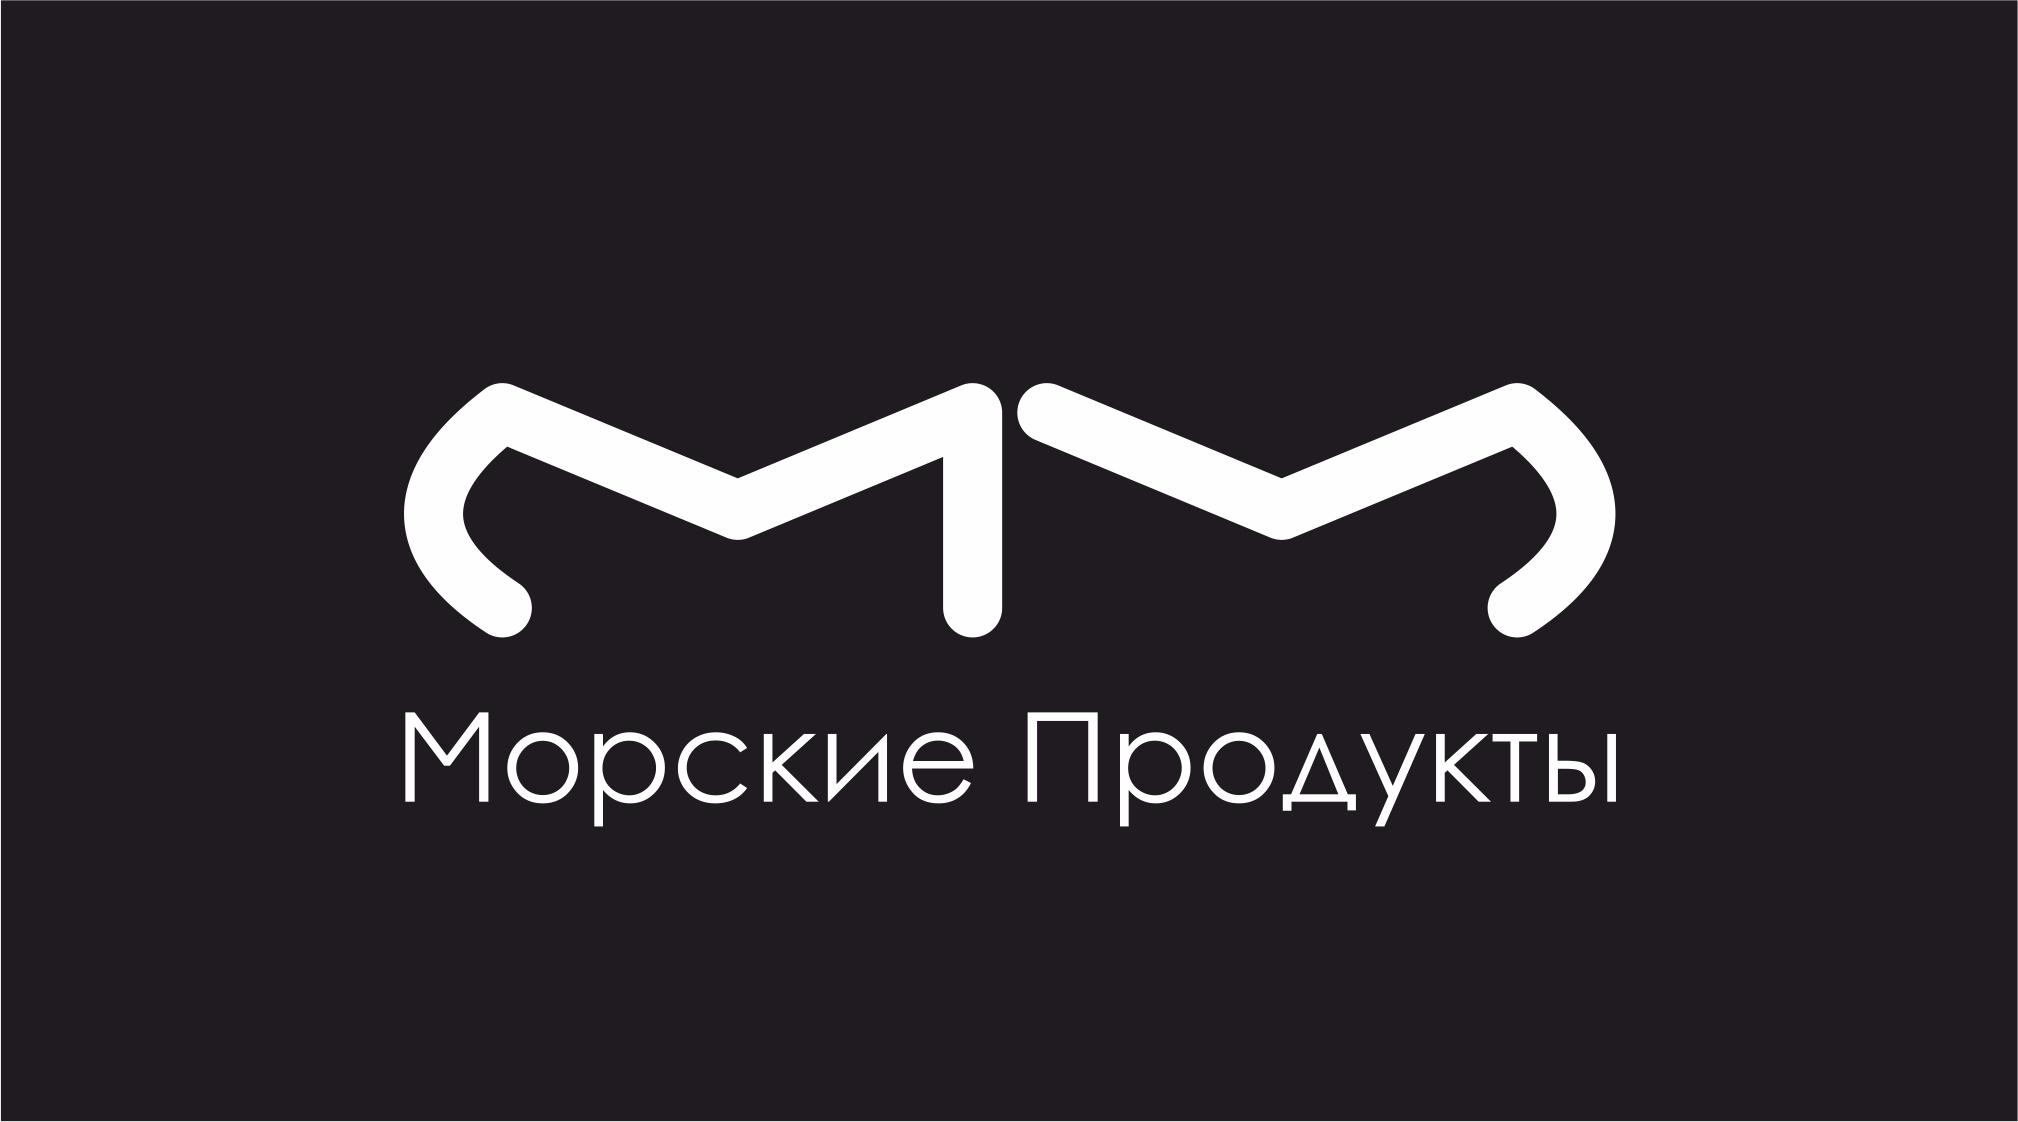 Разработать логотип.  фото f_8025ec69a3dca4eb.jpg